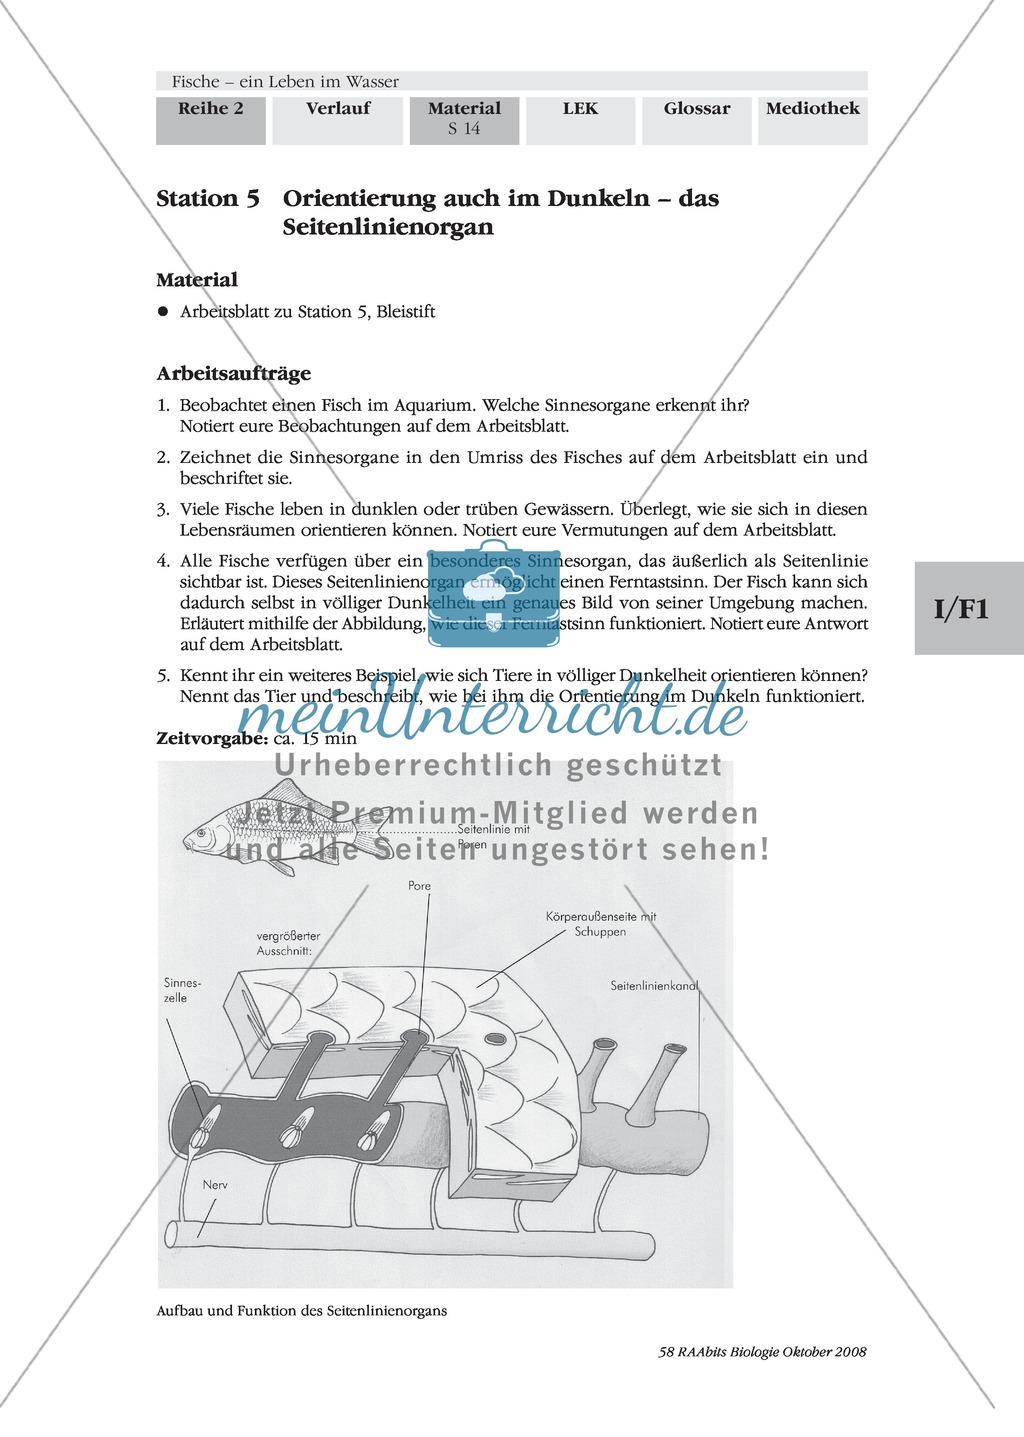 Beautiful Literaturkreis Arbeitsblatt Pdf Composition - Kindergarten ...